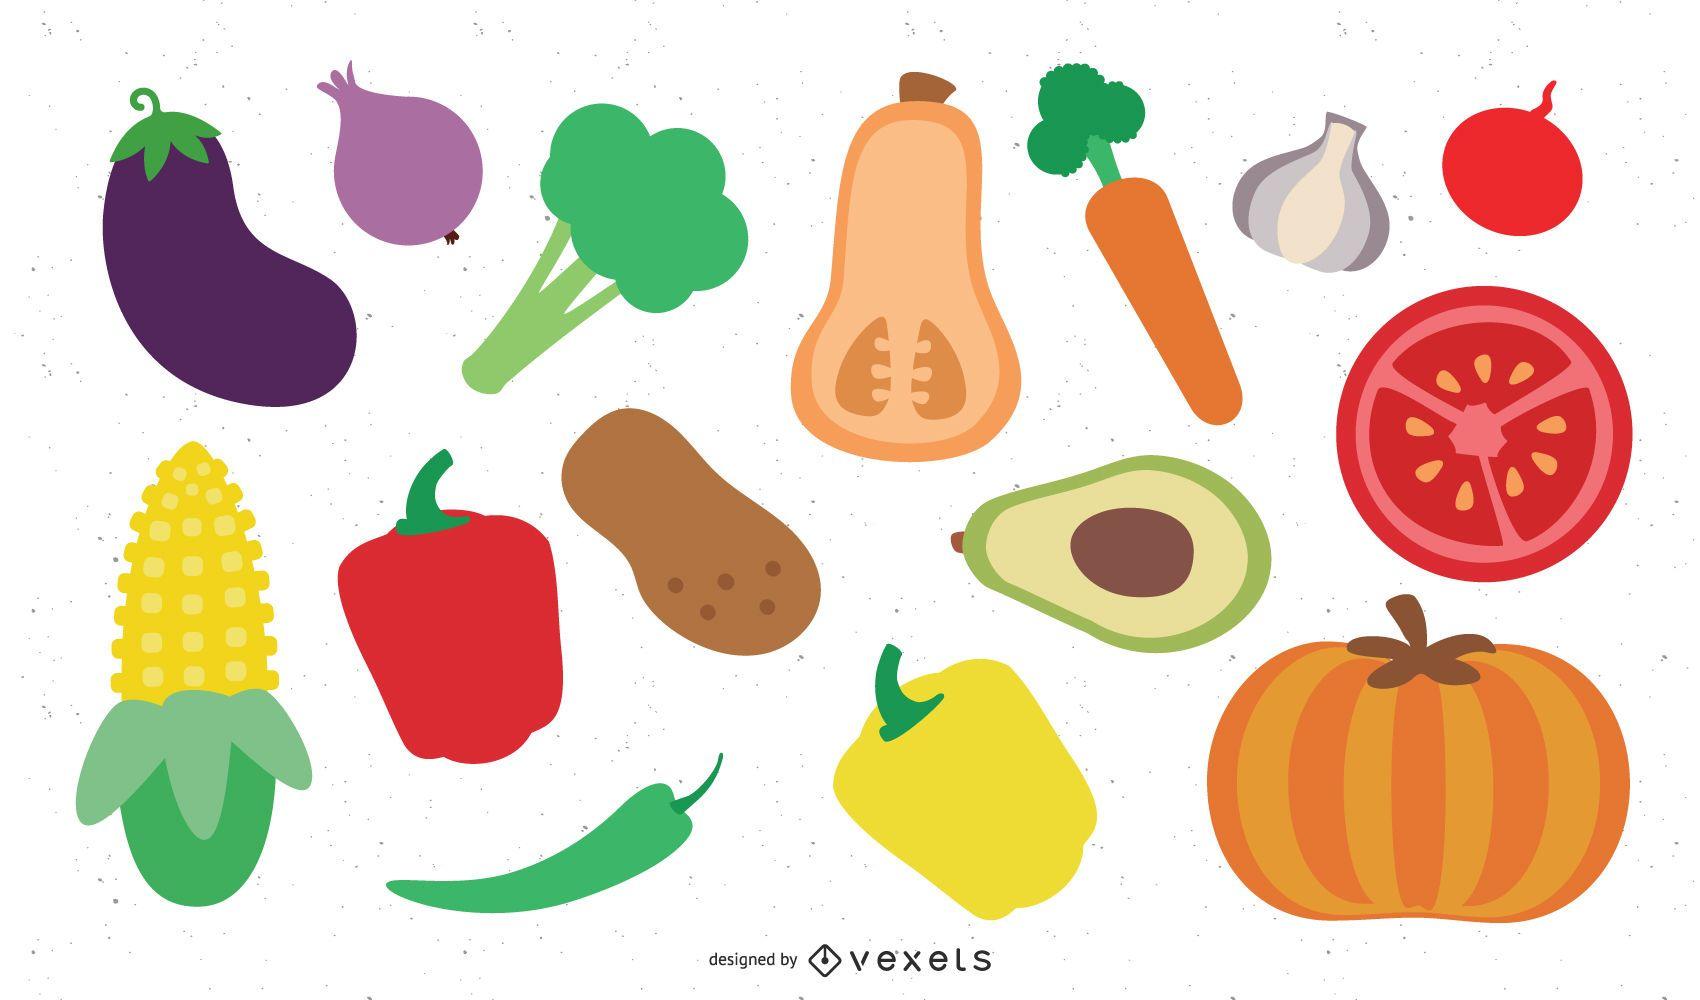 Set of 18 colorful vegetables